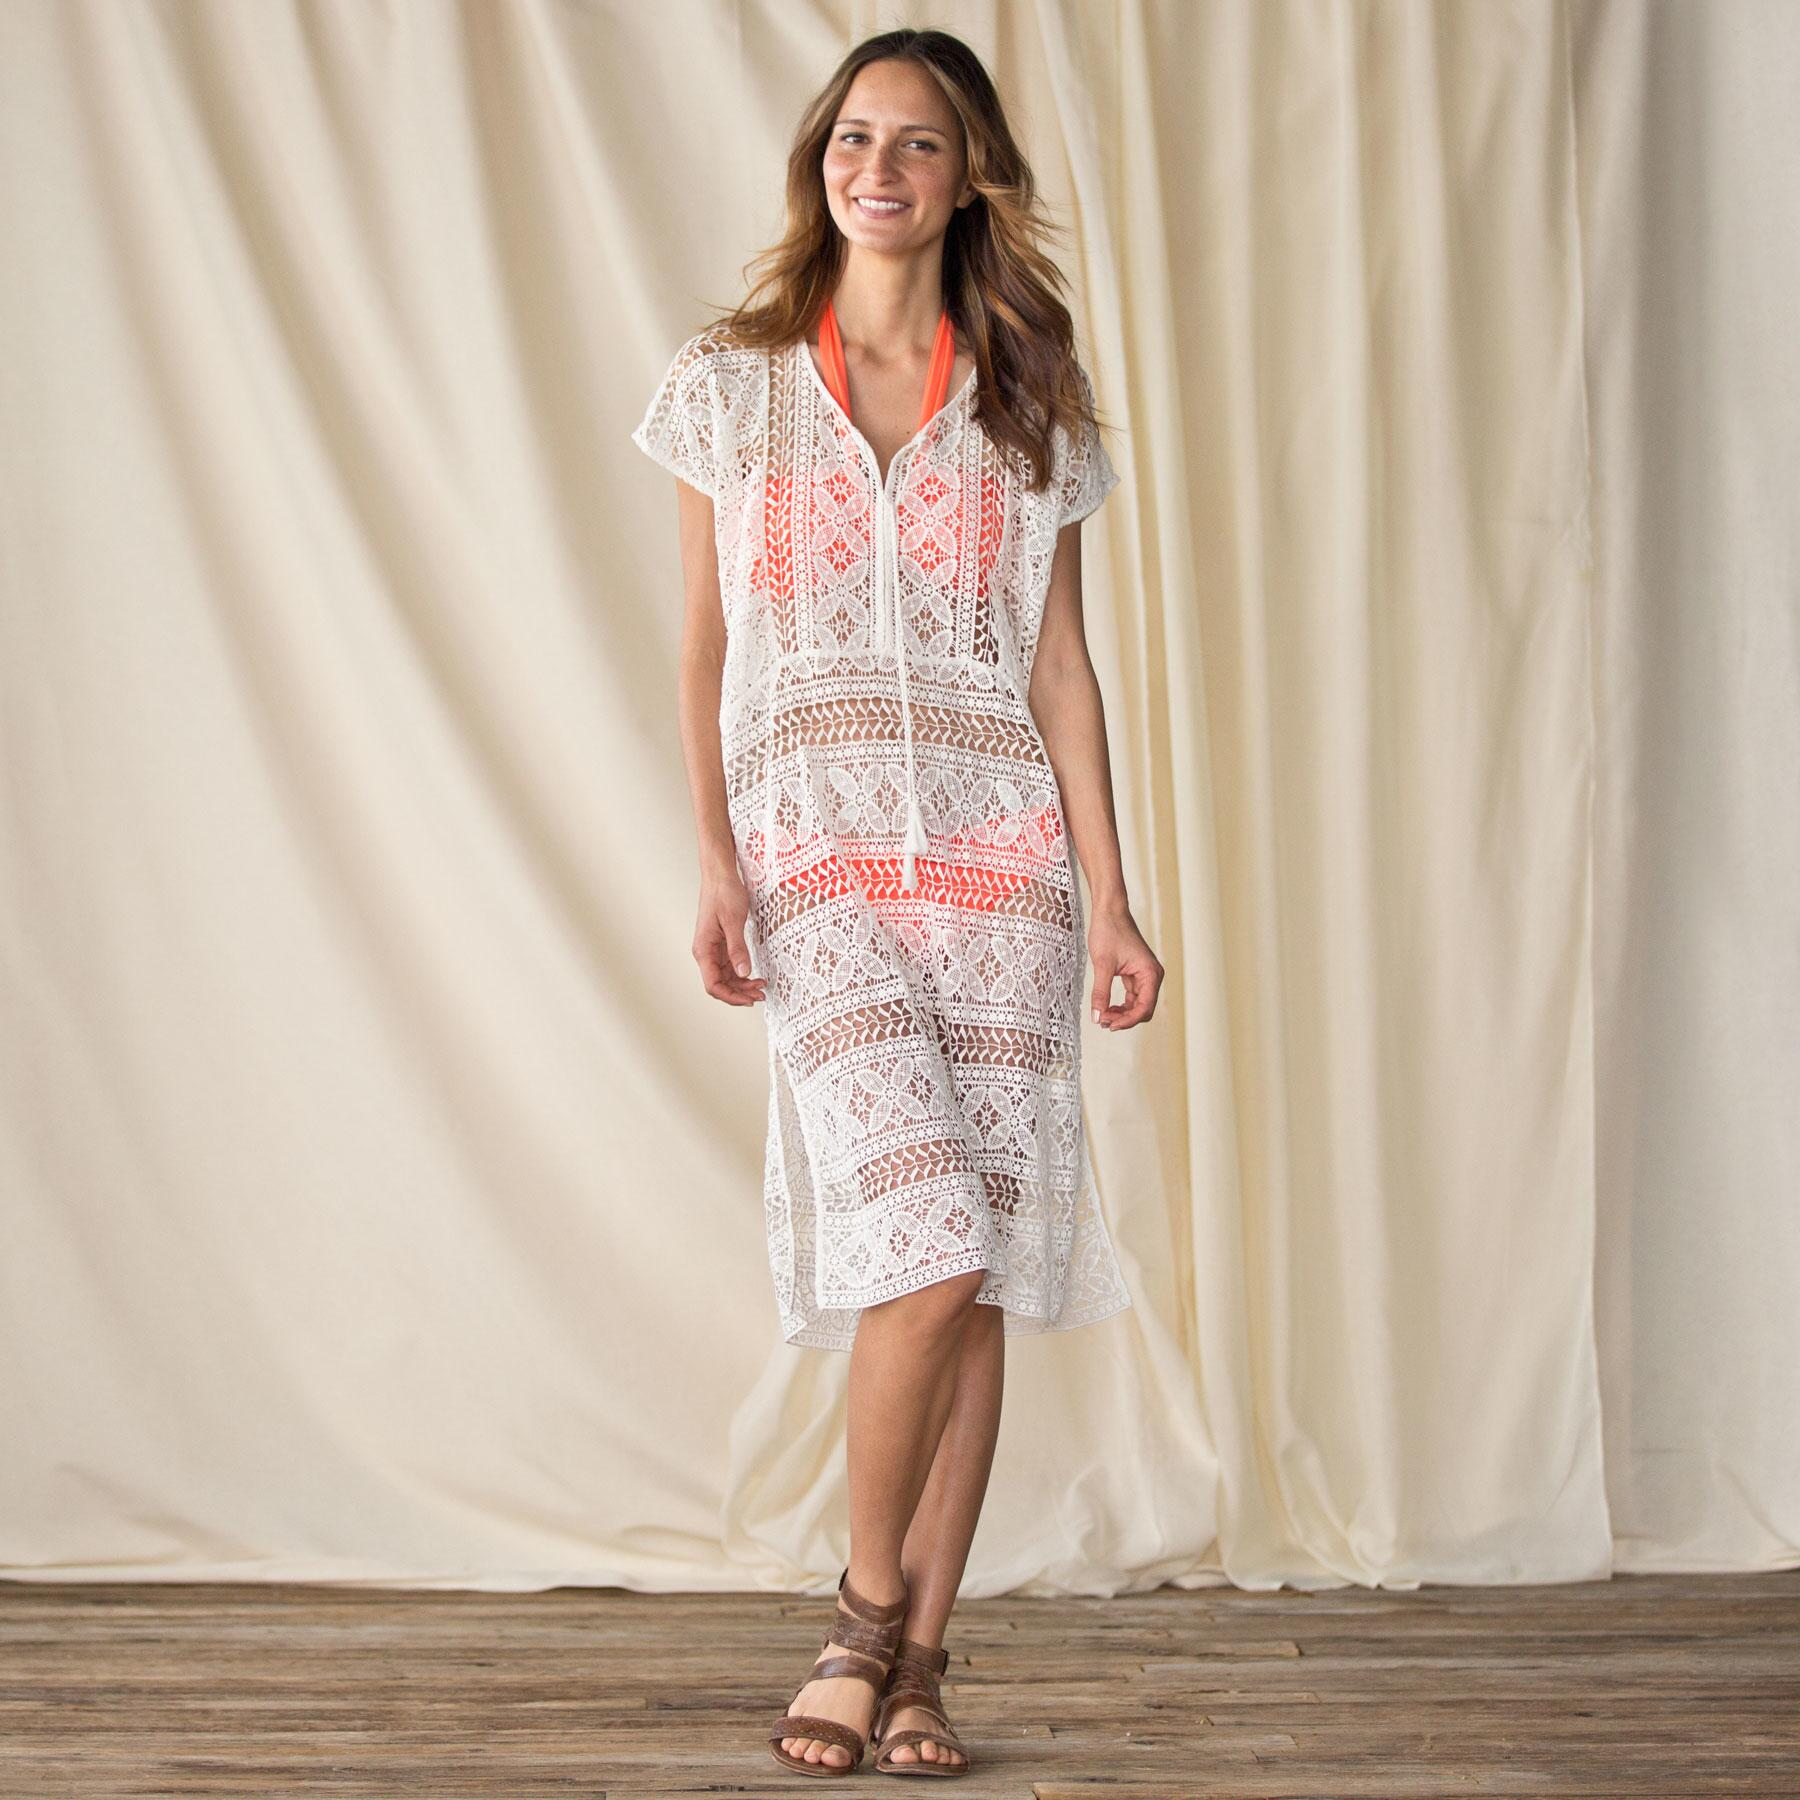 CROCHET DRESS-THE DESERT: View 1